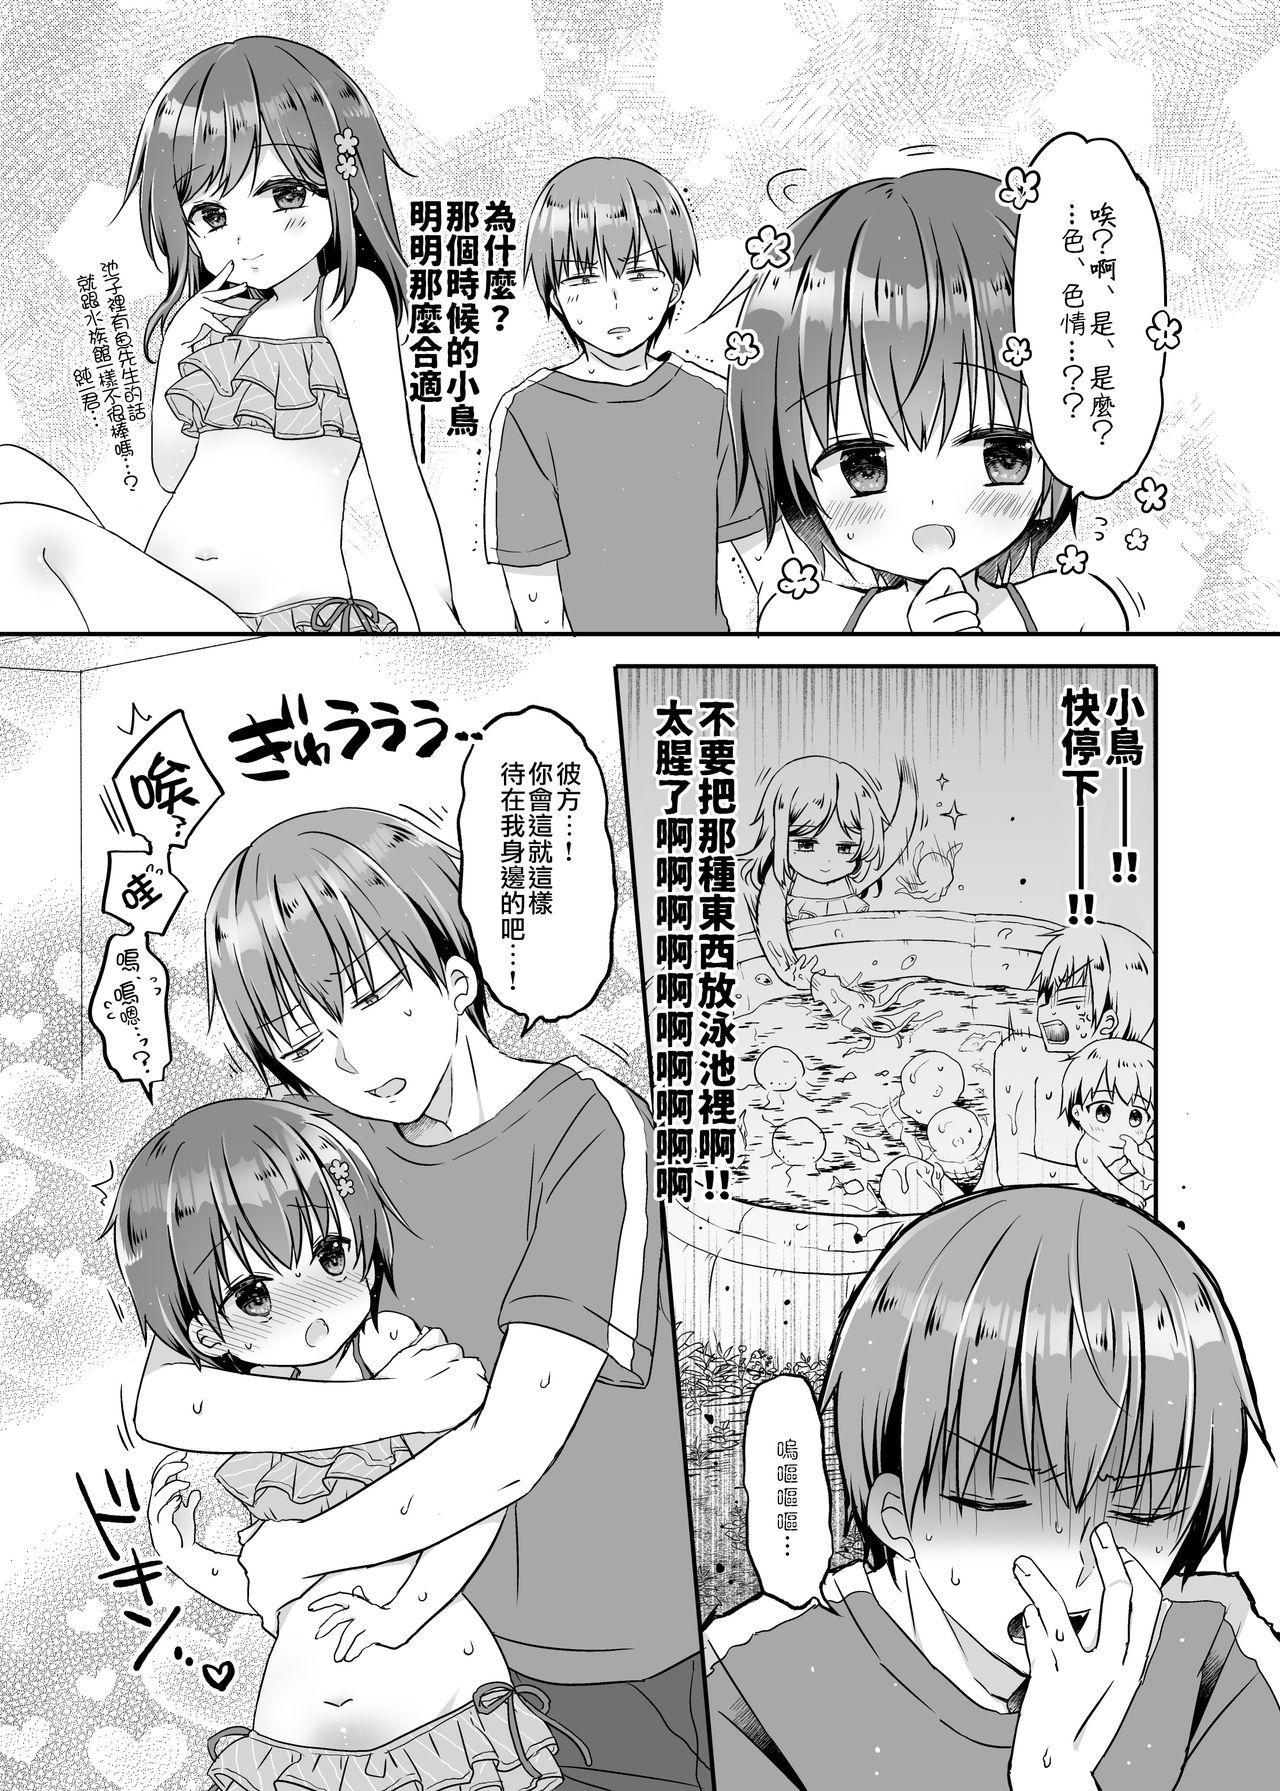 Totsugeki! Rinka no Josou Shounen 5 Ouchi de Mizugi Hen 17